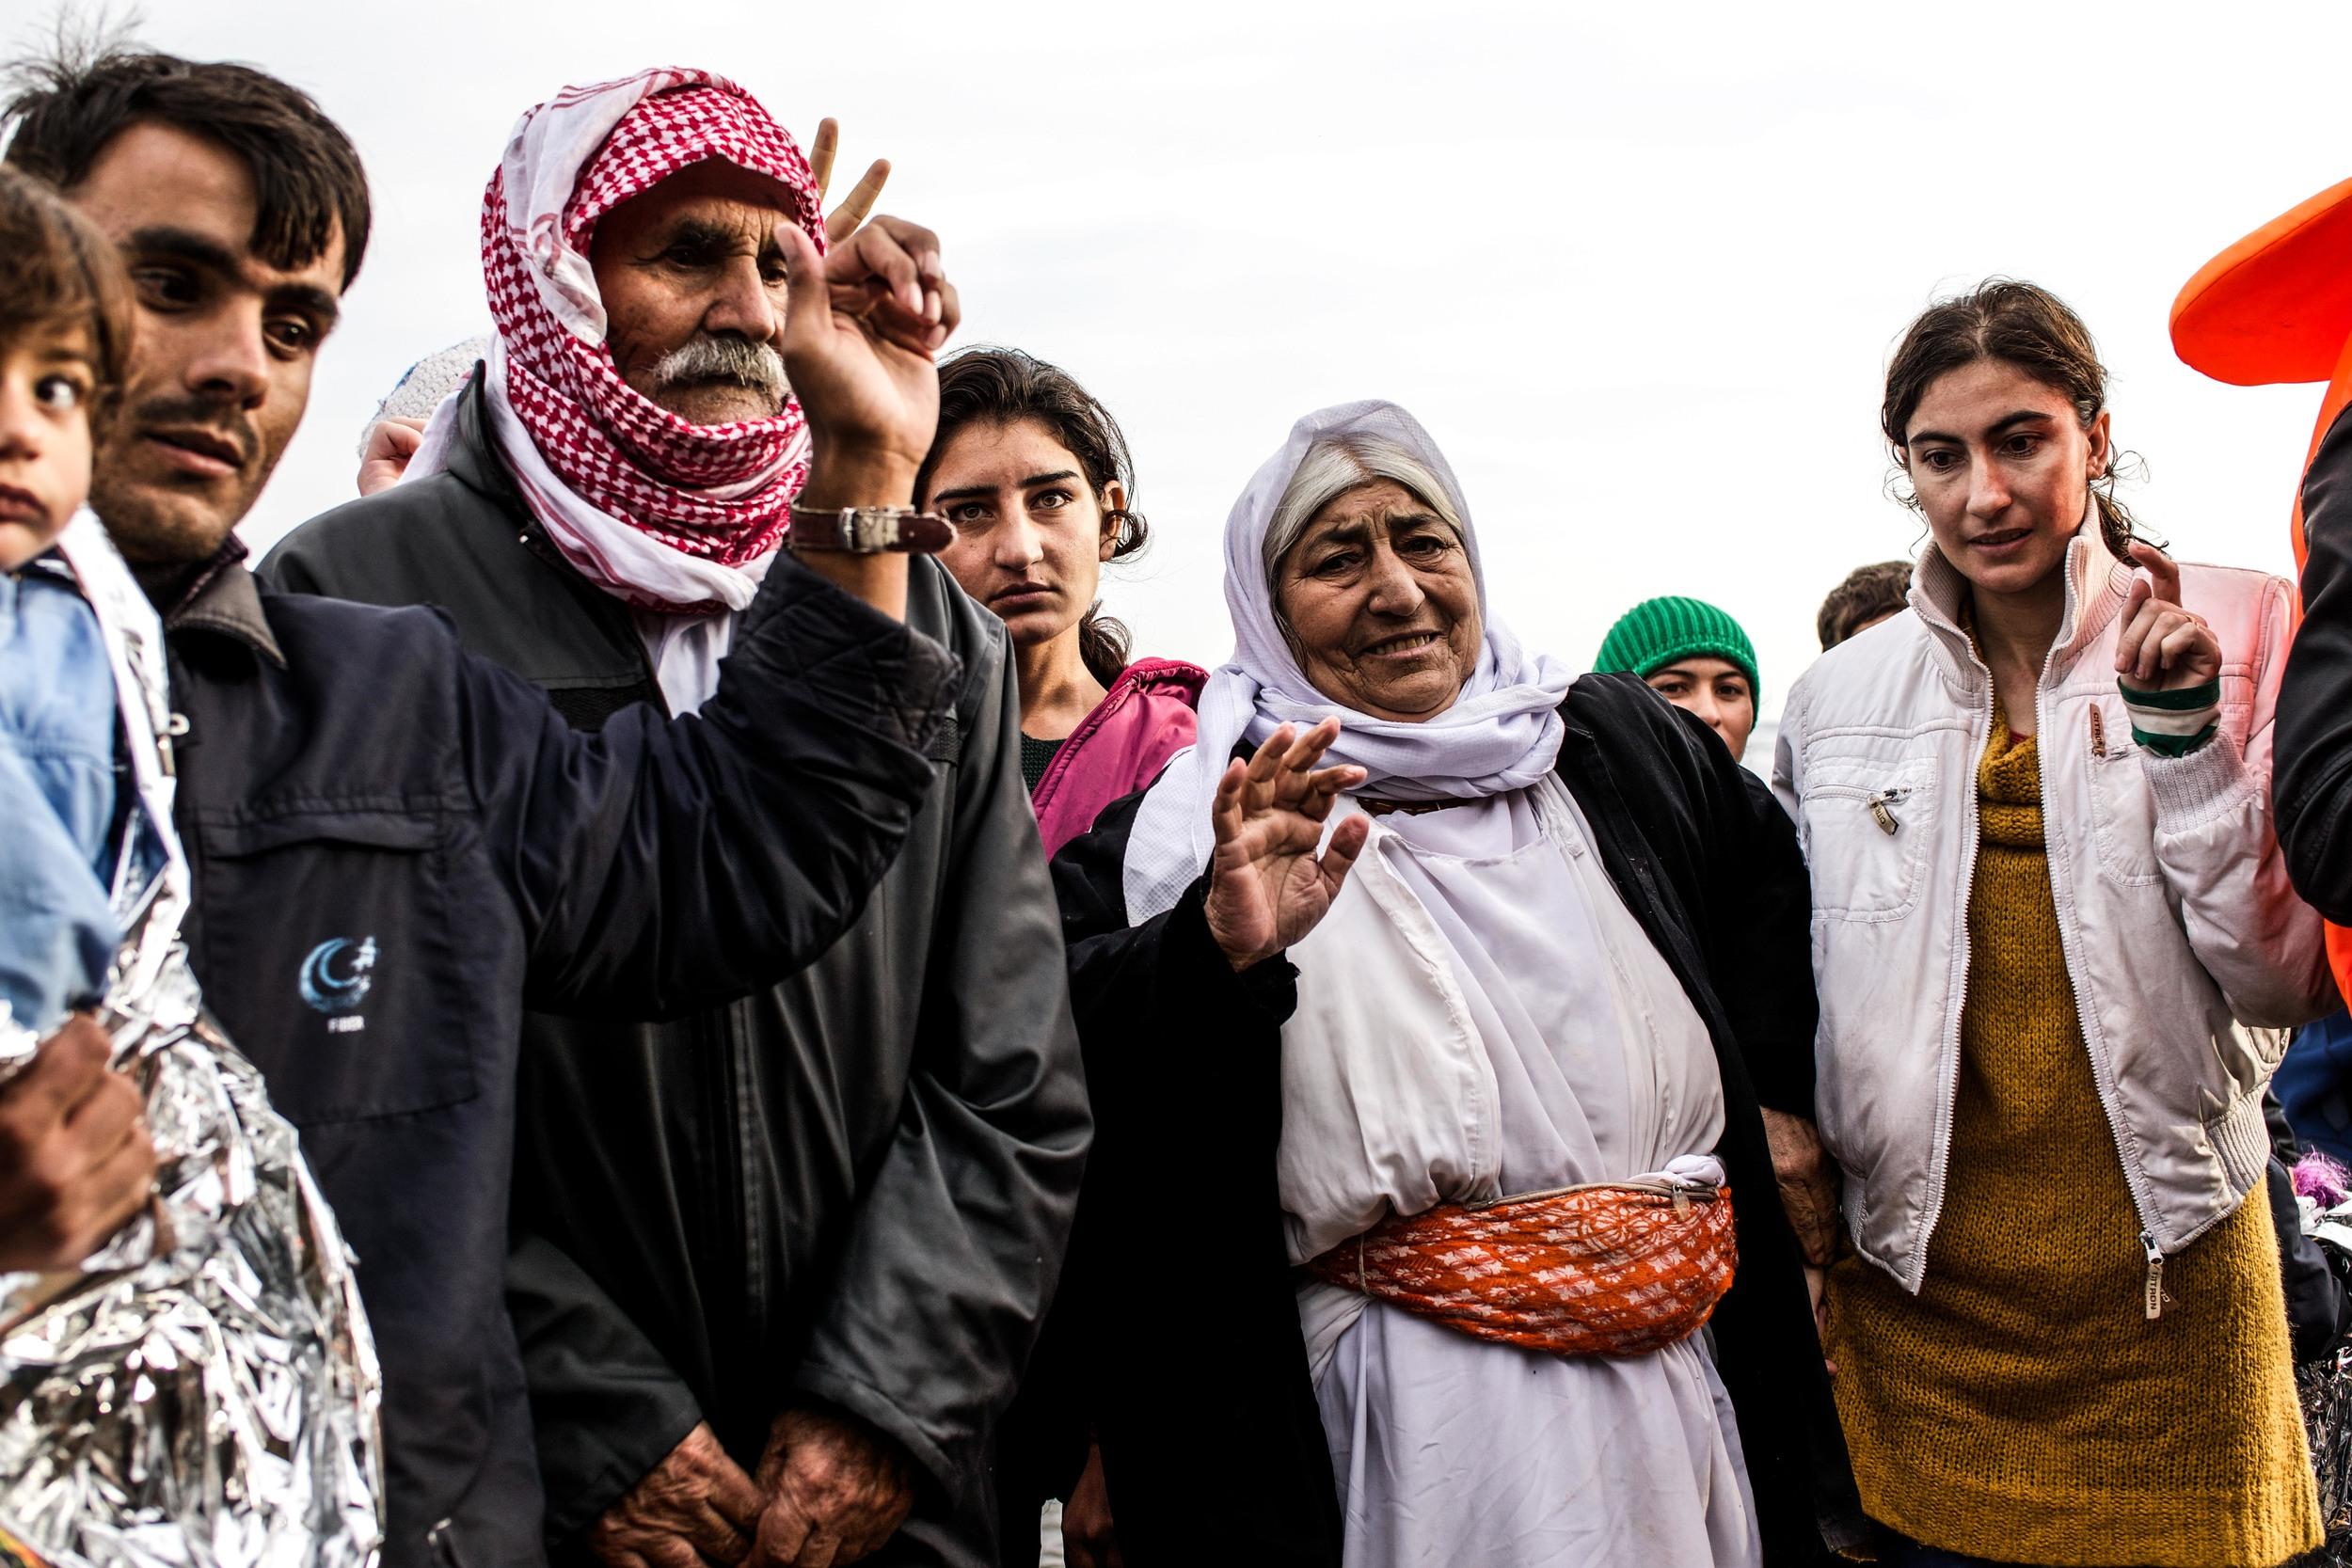 Syrian Refugee Crisis Lesbos Greece November 2015 6.jpg